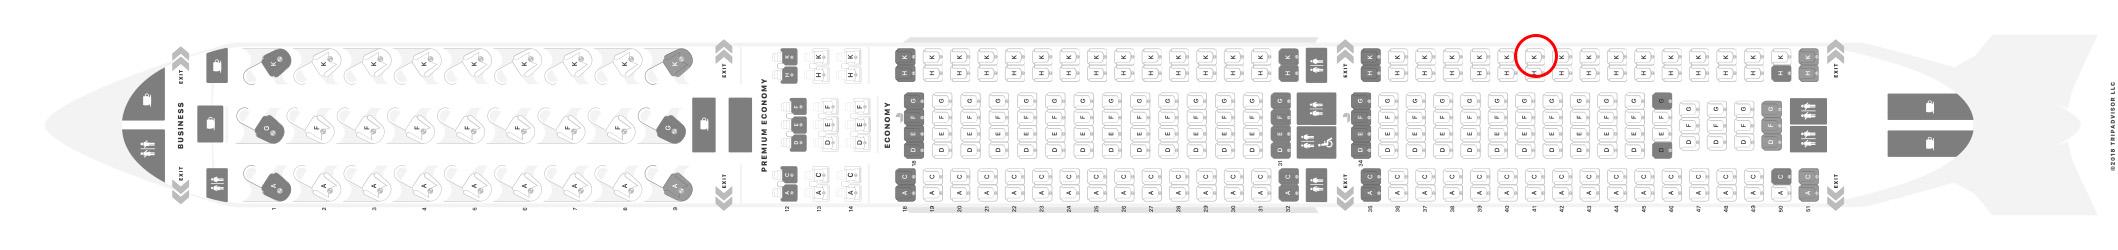 Air Canada A330-300 seat map